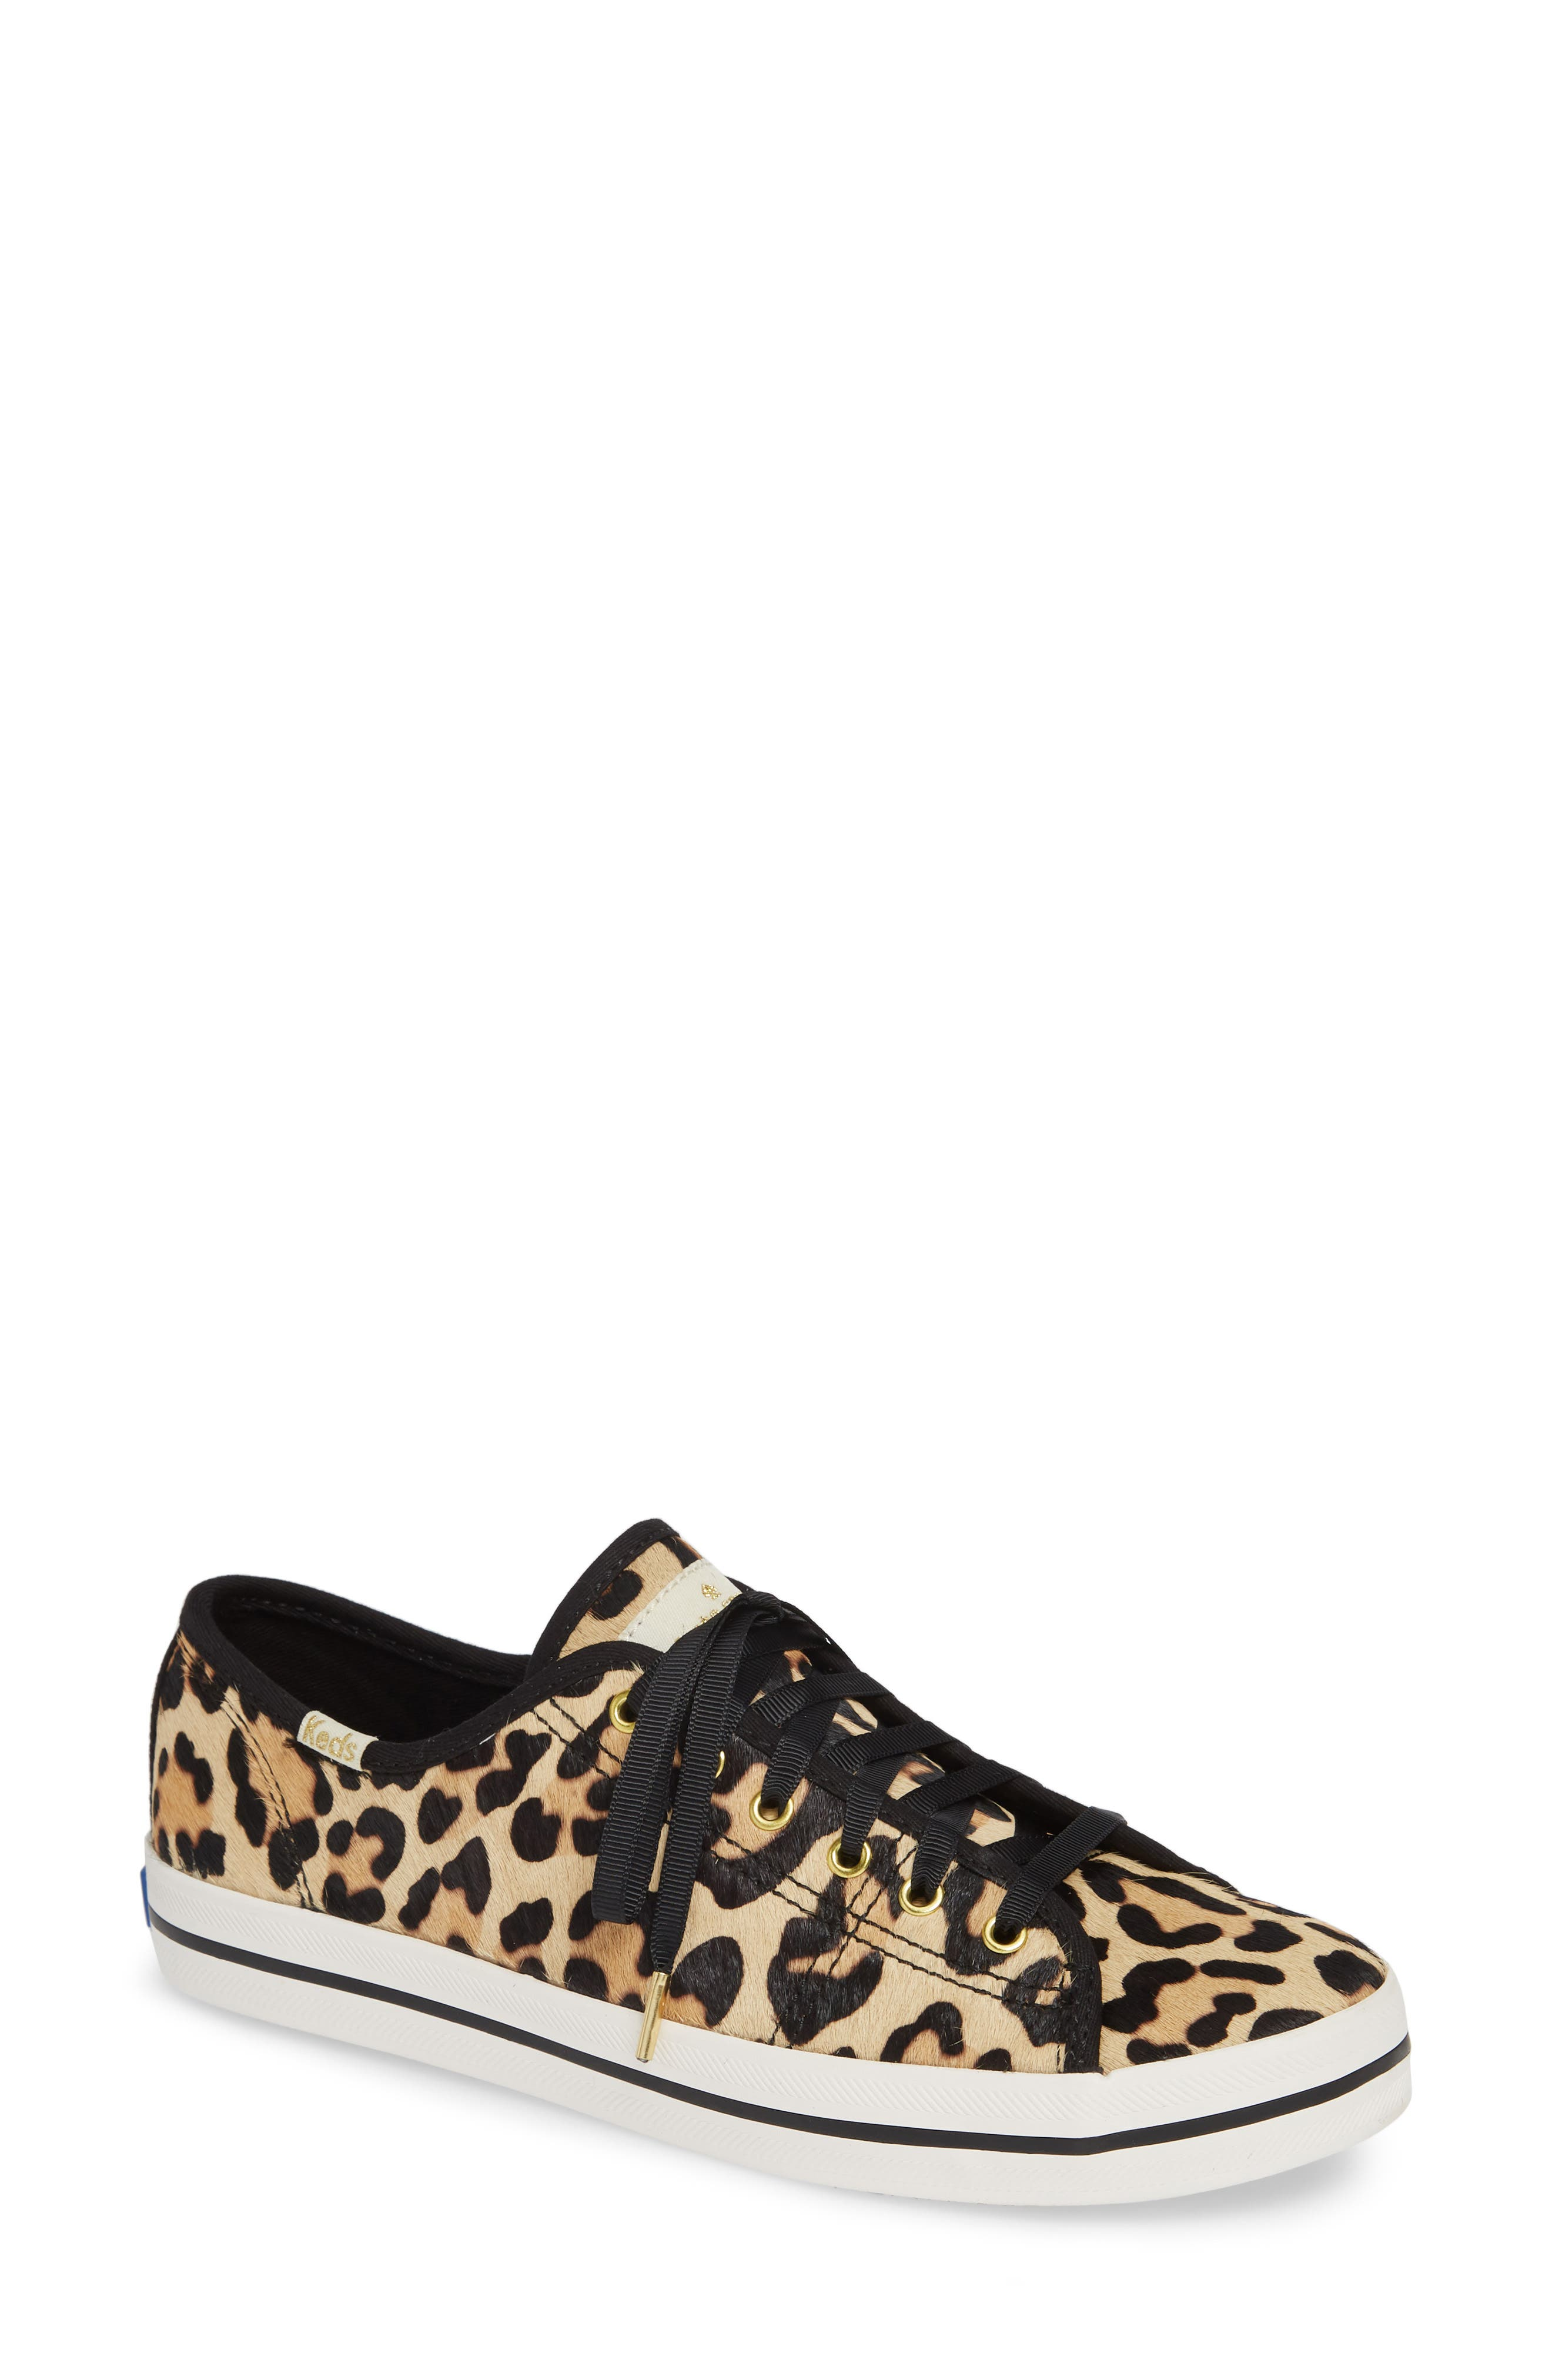 KEDS<SUP>®</SUP> FOR KATE SPADE NEW YORK, kickstart genuine calf hair sneaker, Main thumbnail 1, color, TAN LEOPARD CALF HAIR